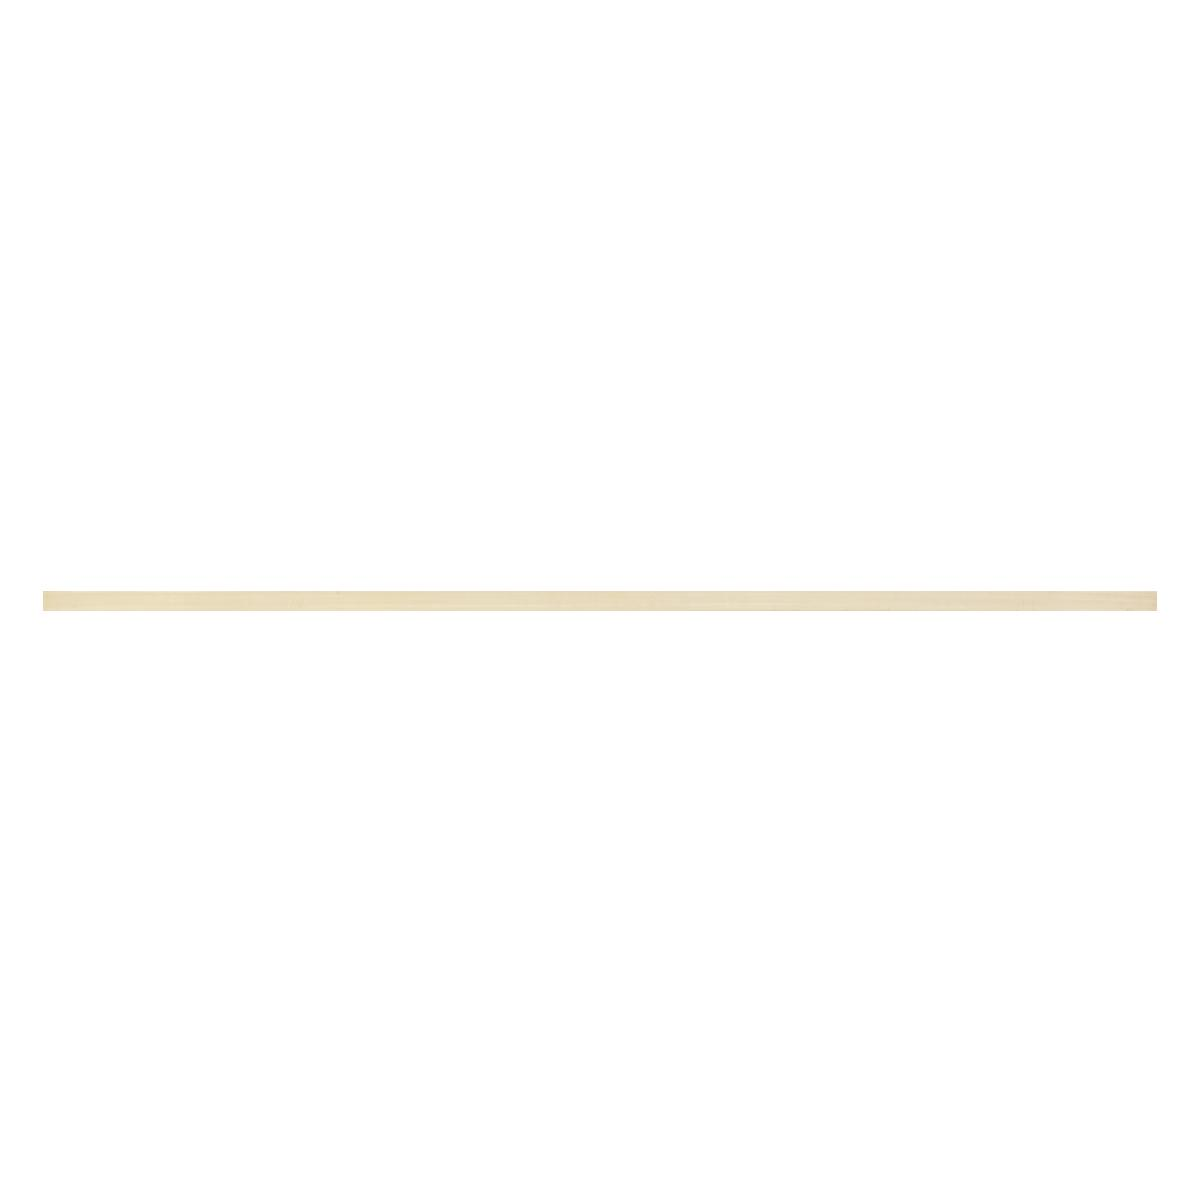 Perfil De Terminación European Classic Roble Sandstone Mate - 5X200 cm